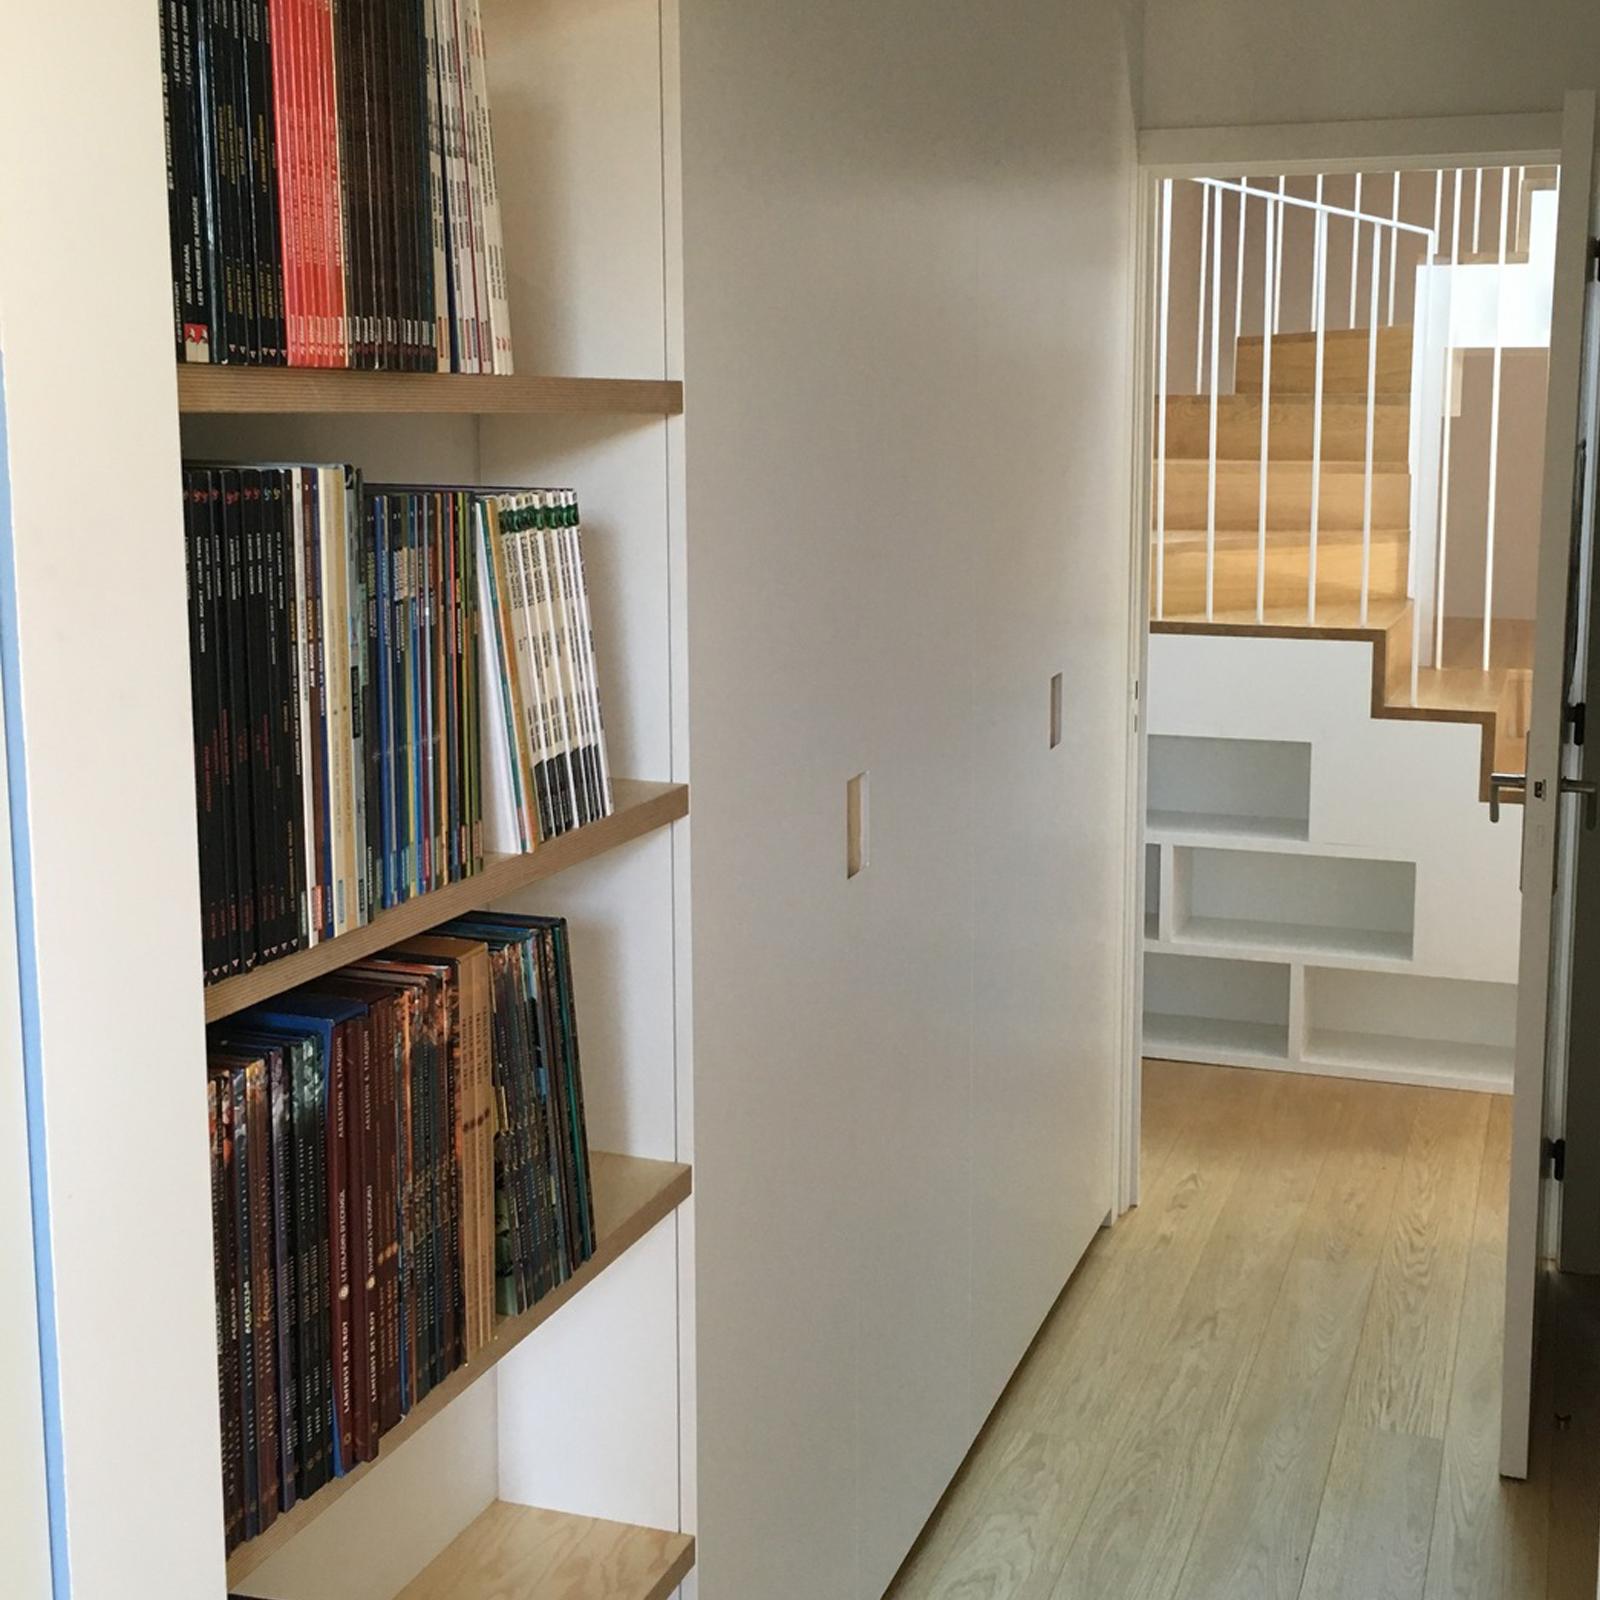 menuiserie wood id meuble sur mesure b nisterie etc. Black Bedroom Furniture Sets. Home Design Ideas